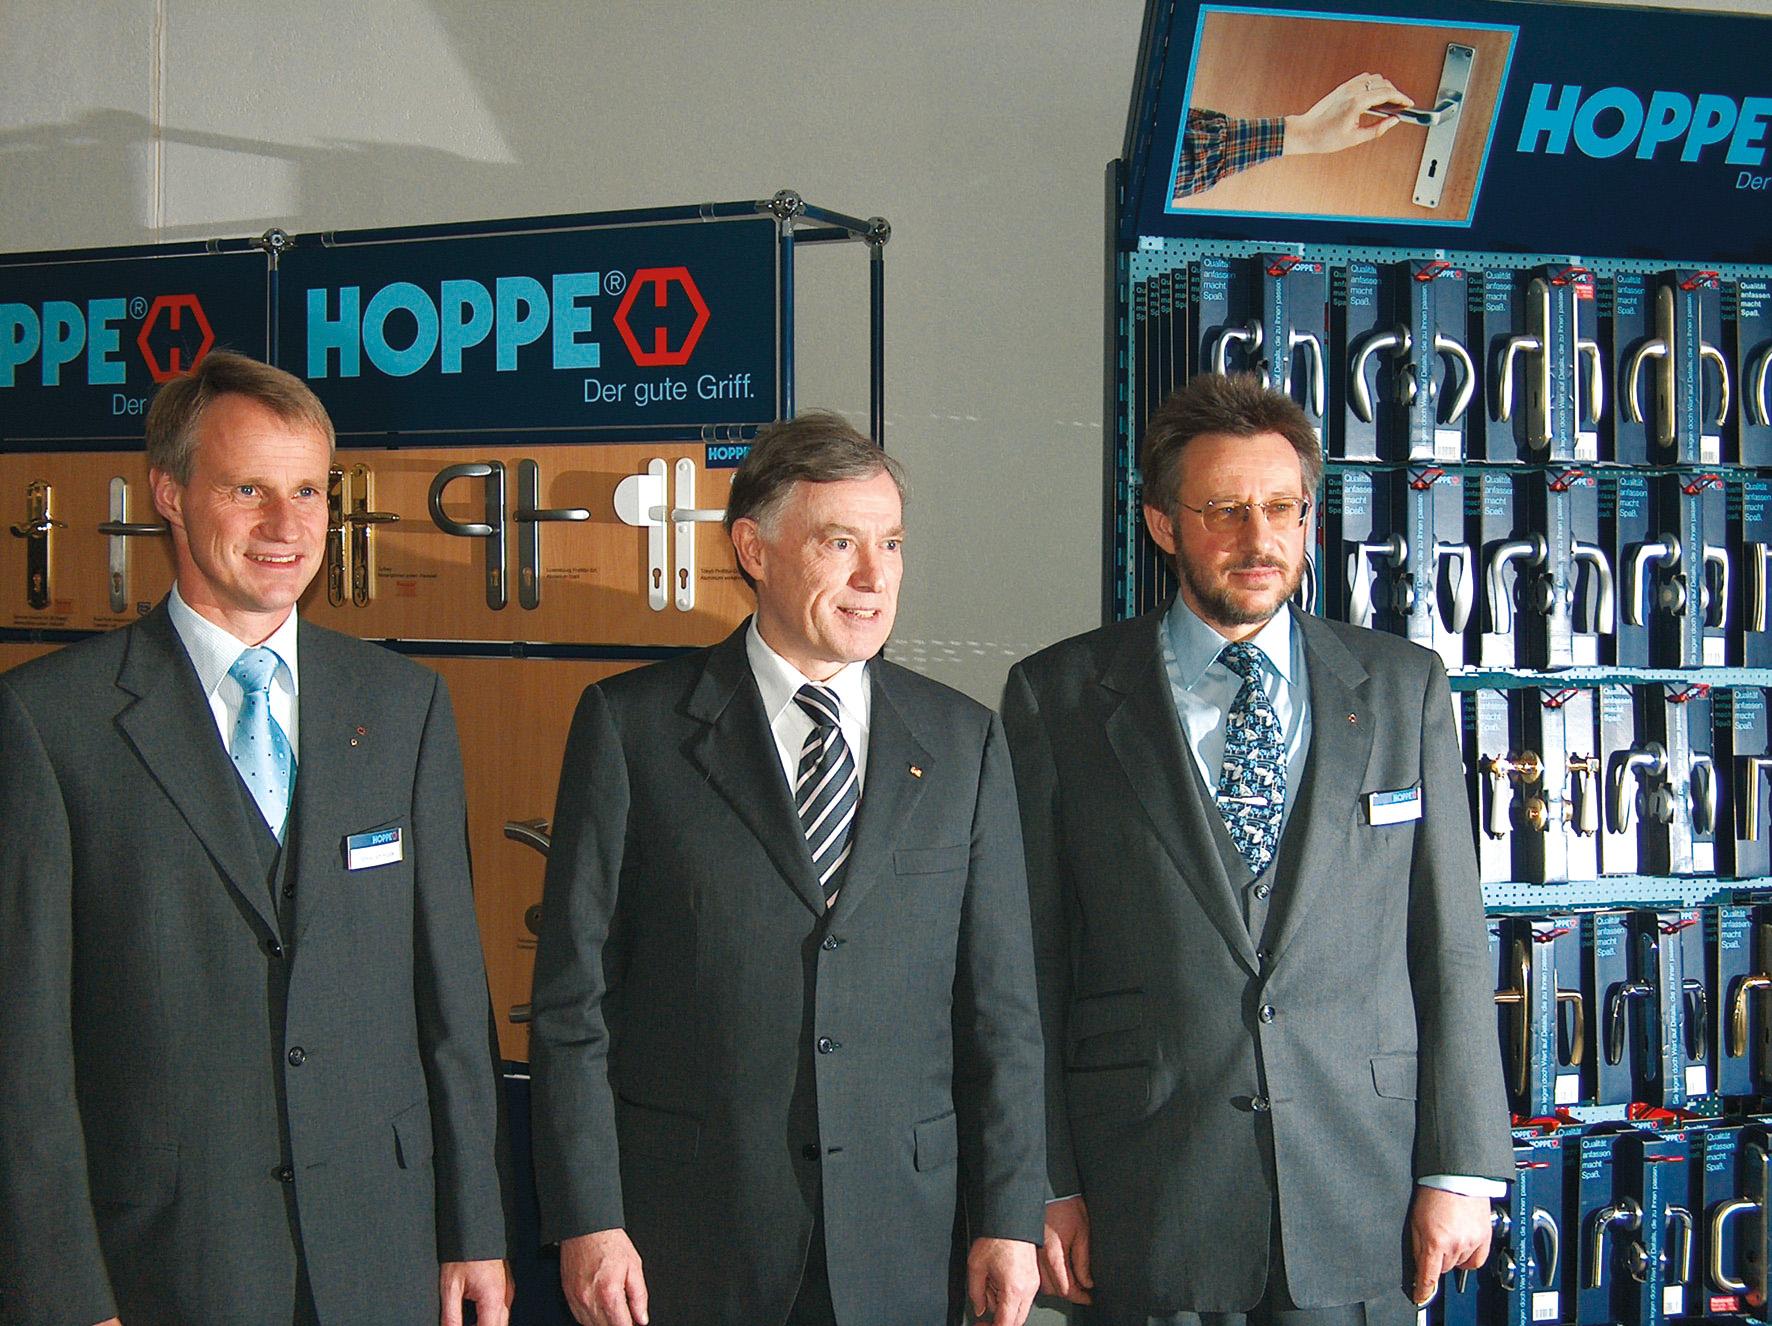 09.12.2005: Visiting German President Köhler in HOPPE plant in Crottendorf